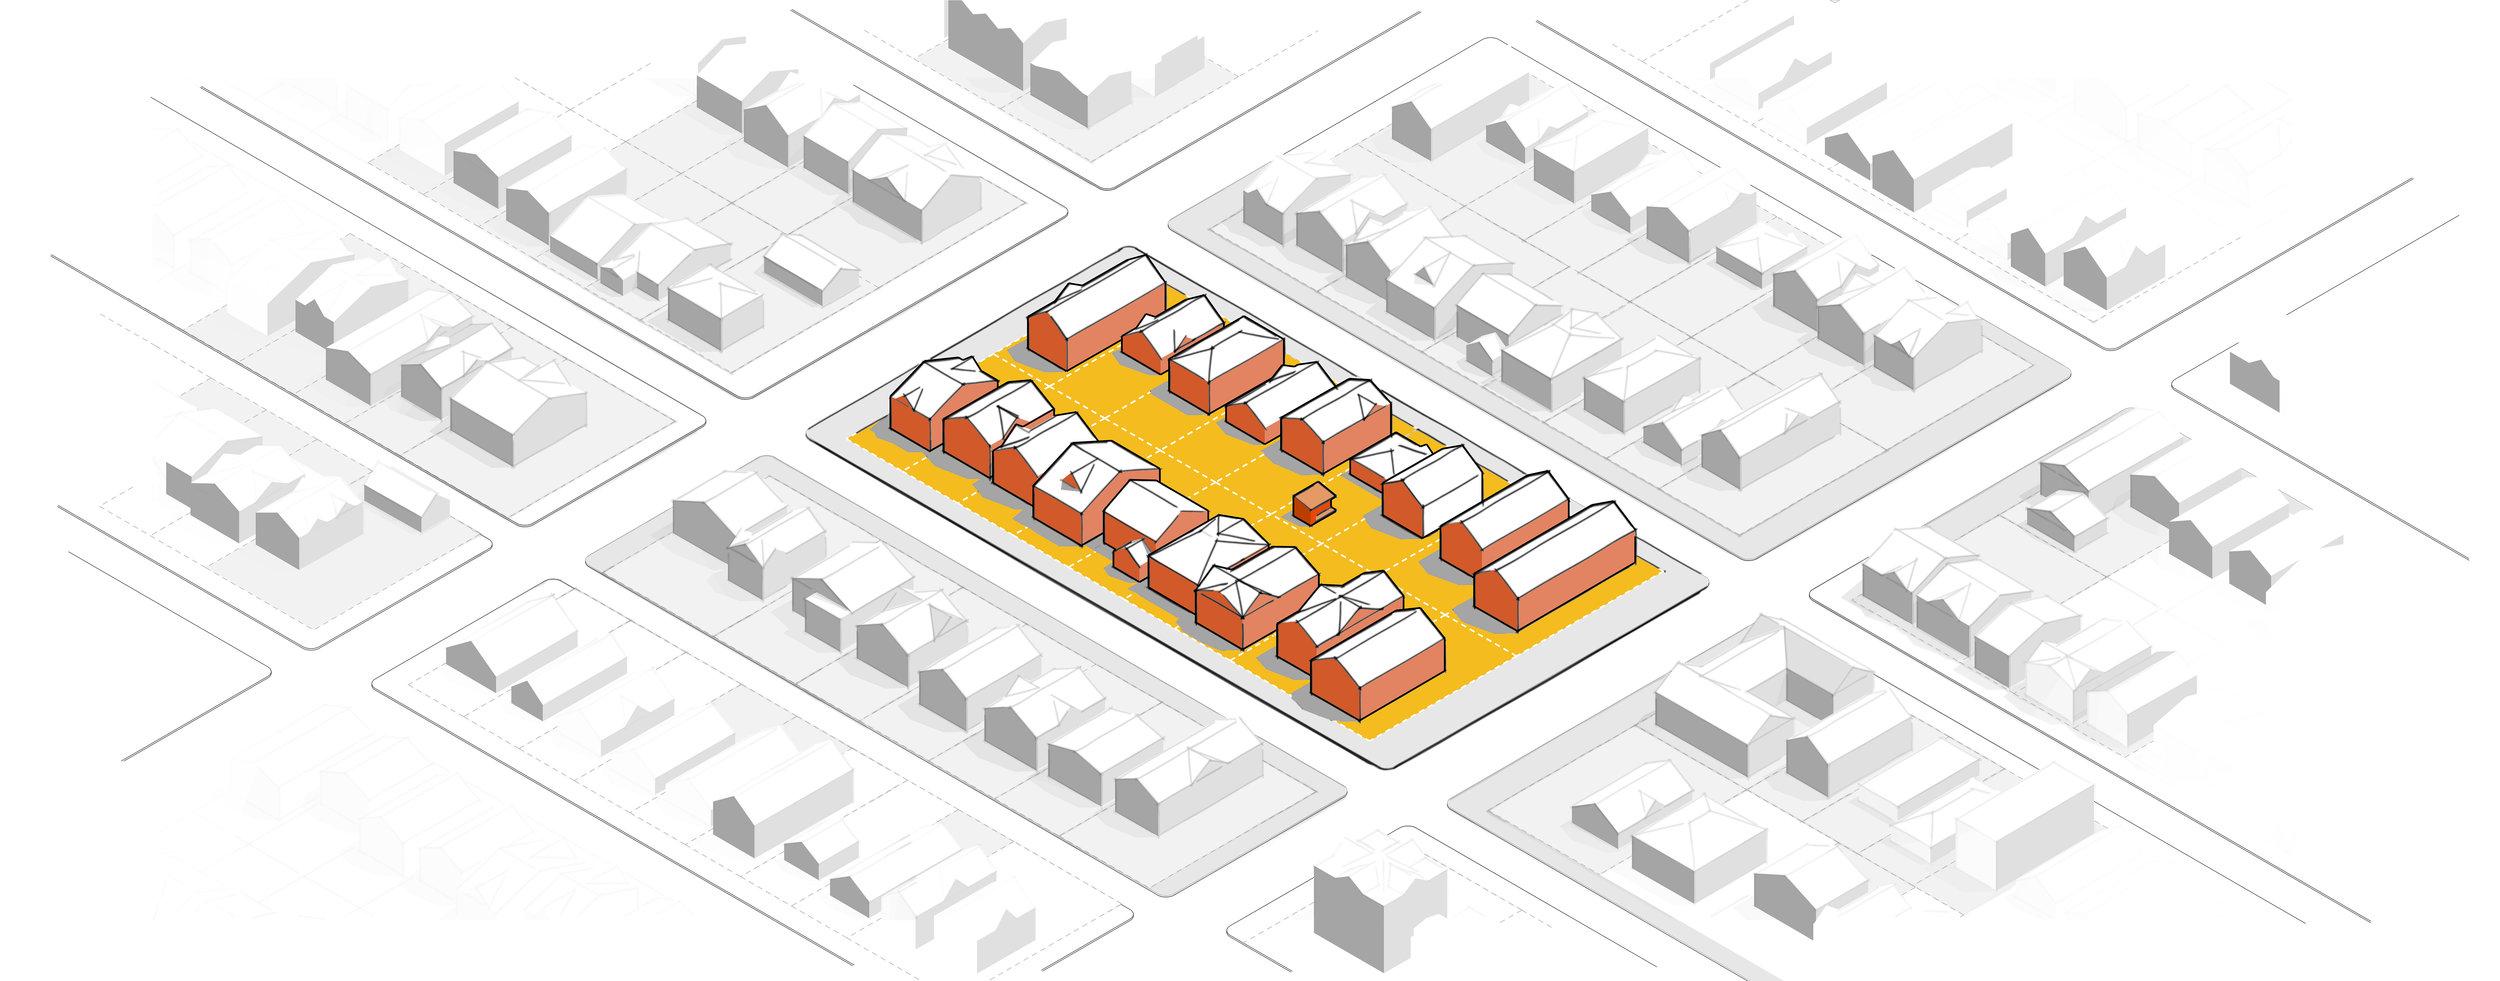 Neighborhood Axon 07_DIAGRAM_Version 02.jpg